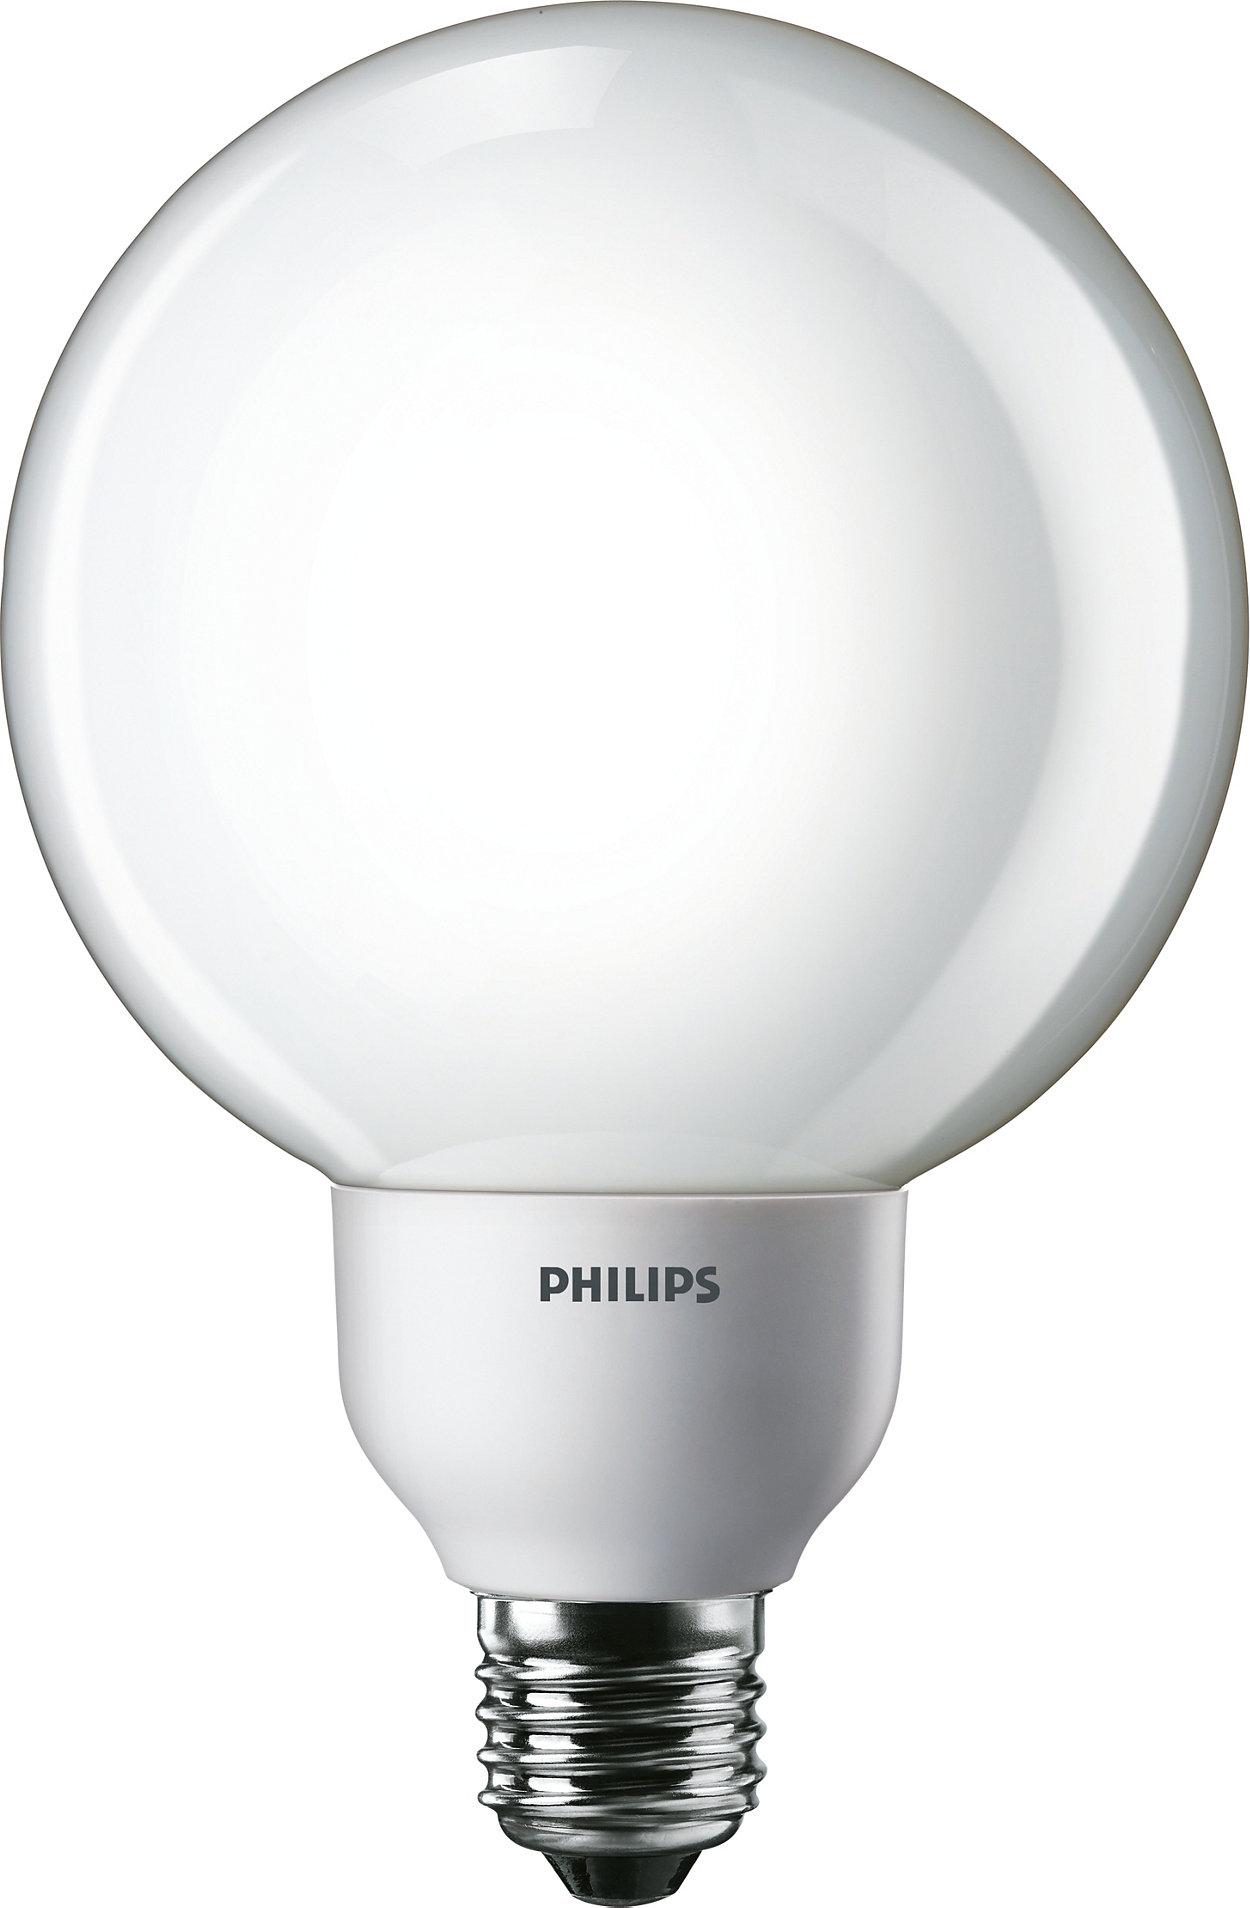 Energy saving lamp in decorative Globe shape